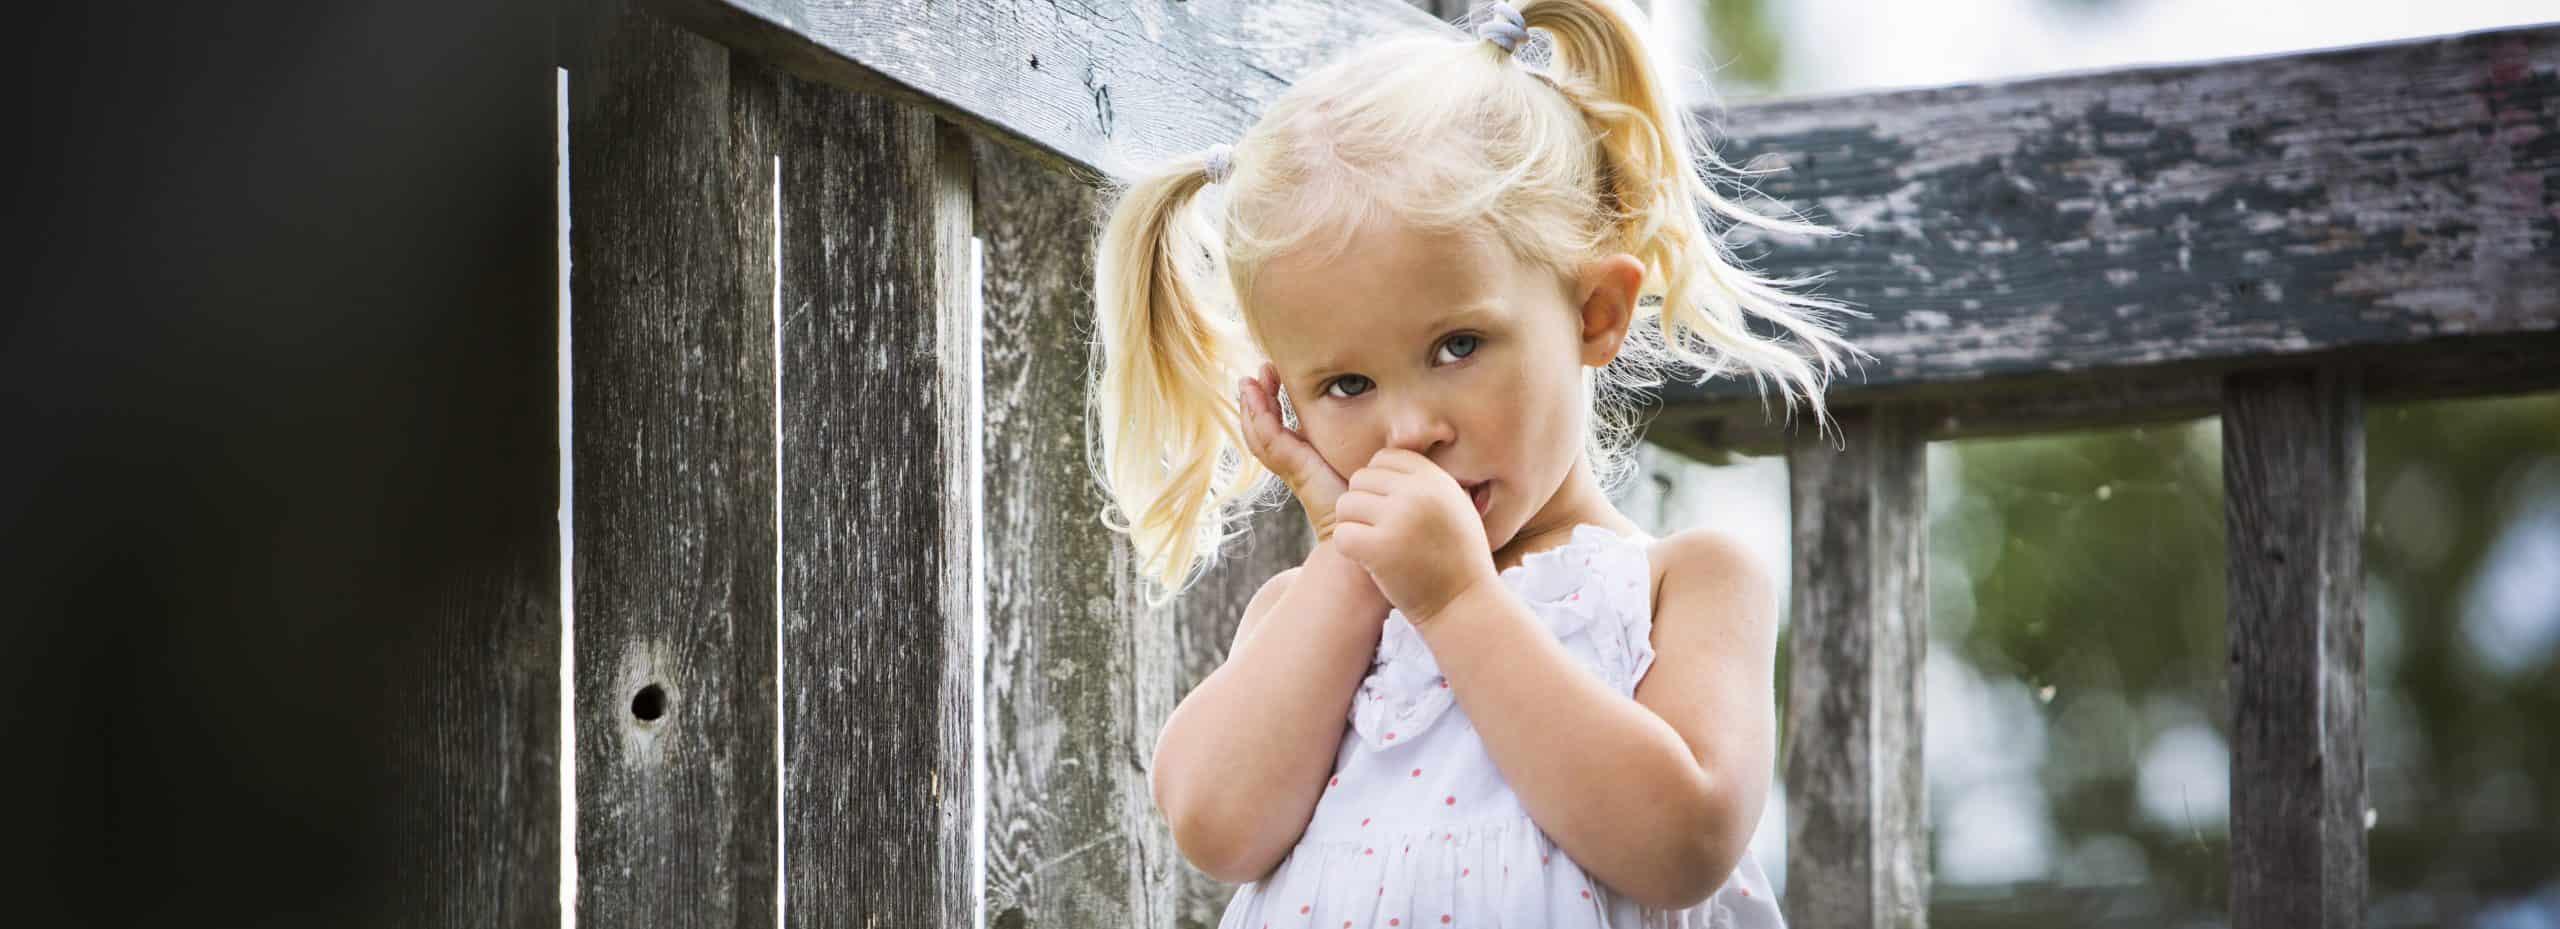 Why Do Kids Suck Their Thumb?